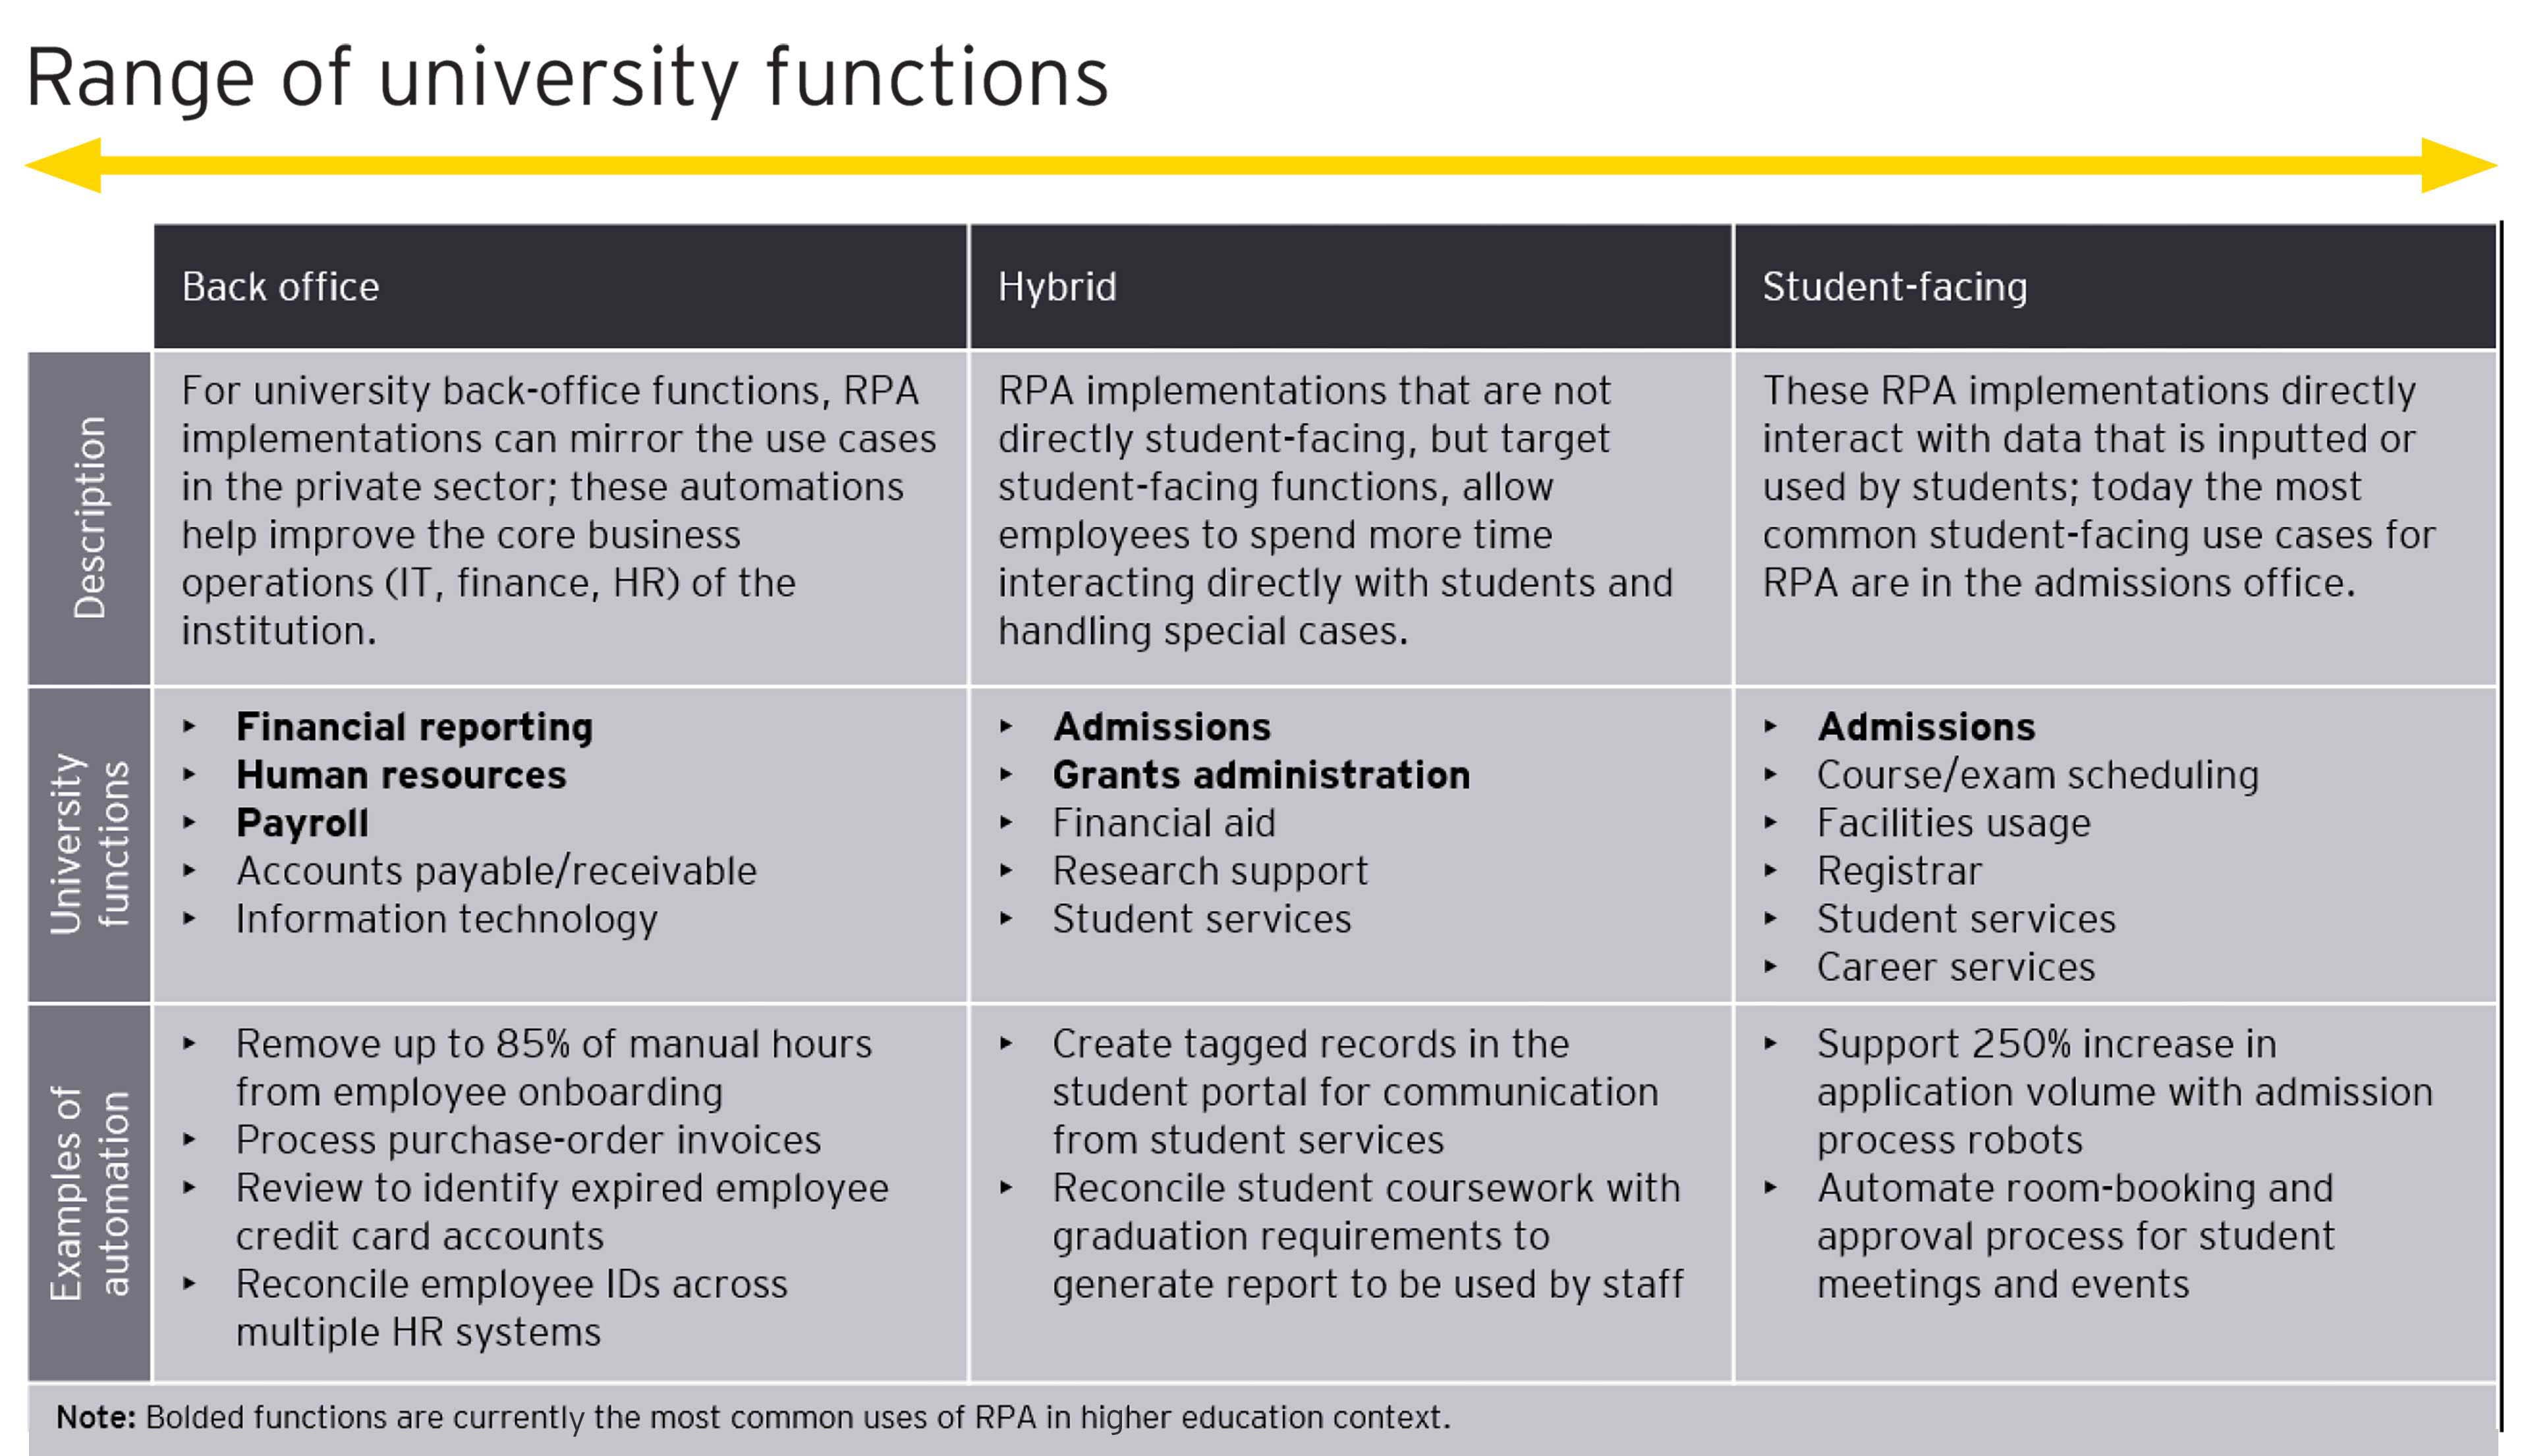 Range of university functions